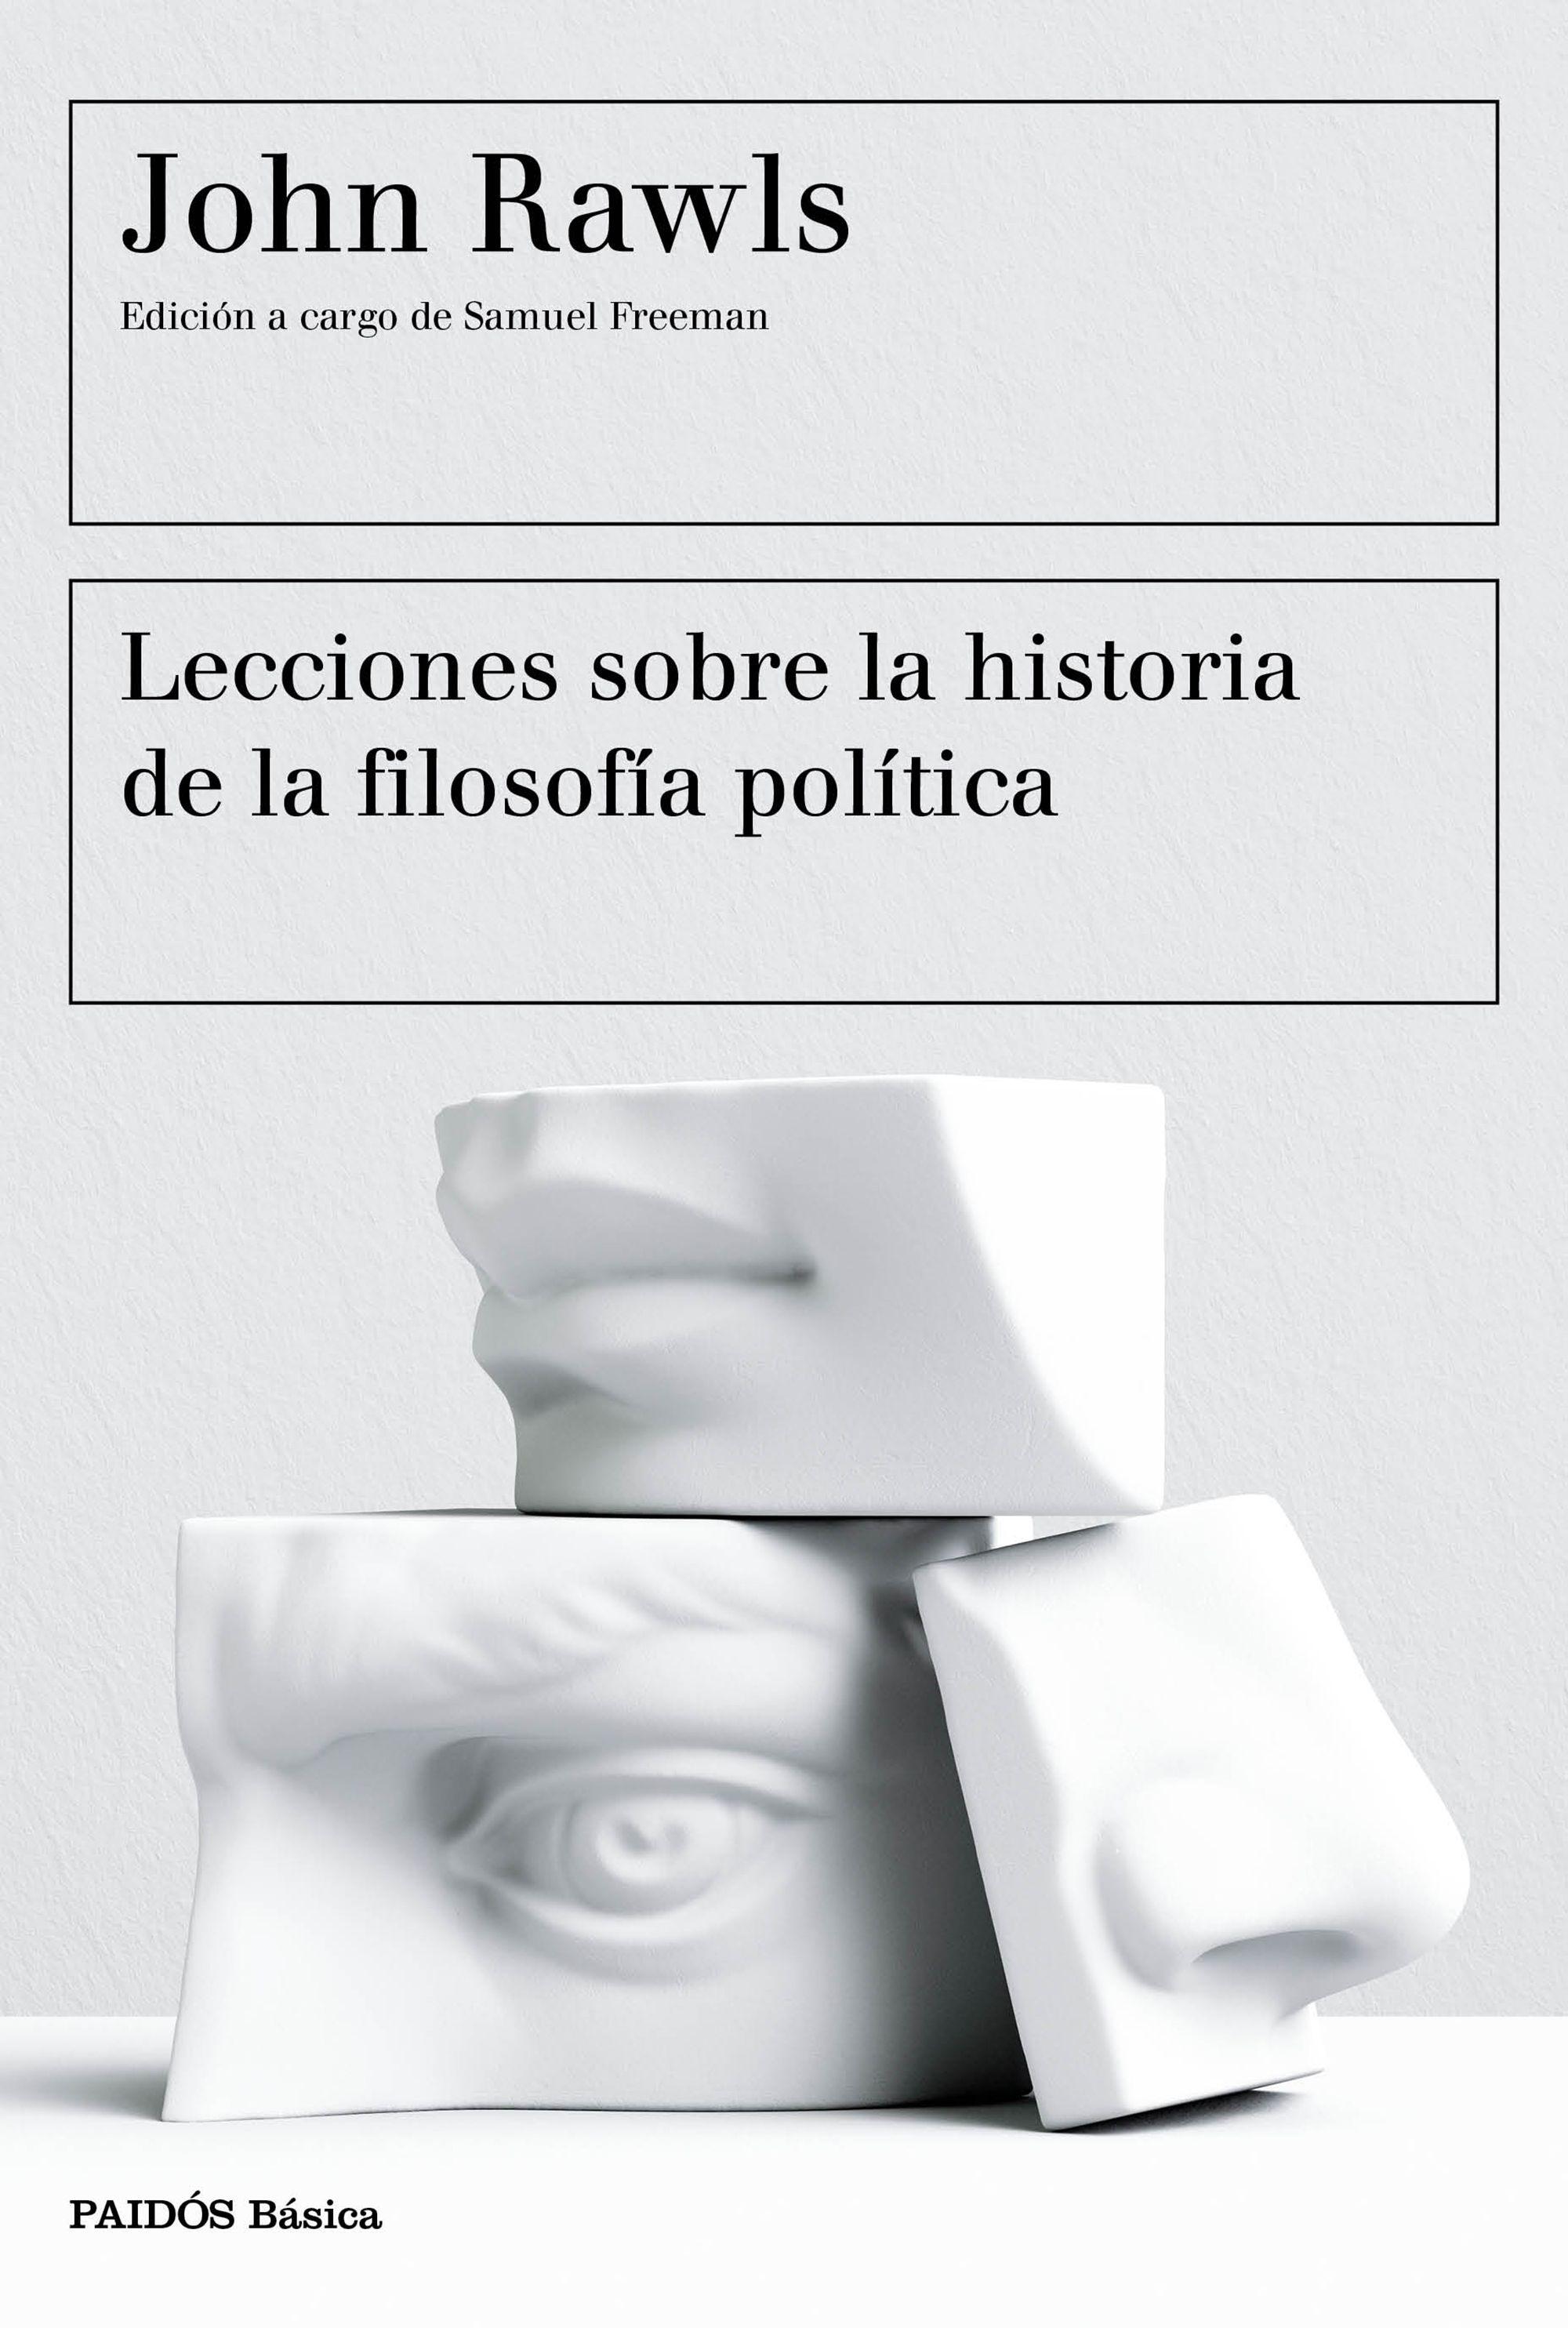 Lecciones Sobre La Historia De La Filosofia Politica por John Rawls epub